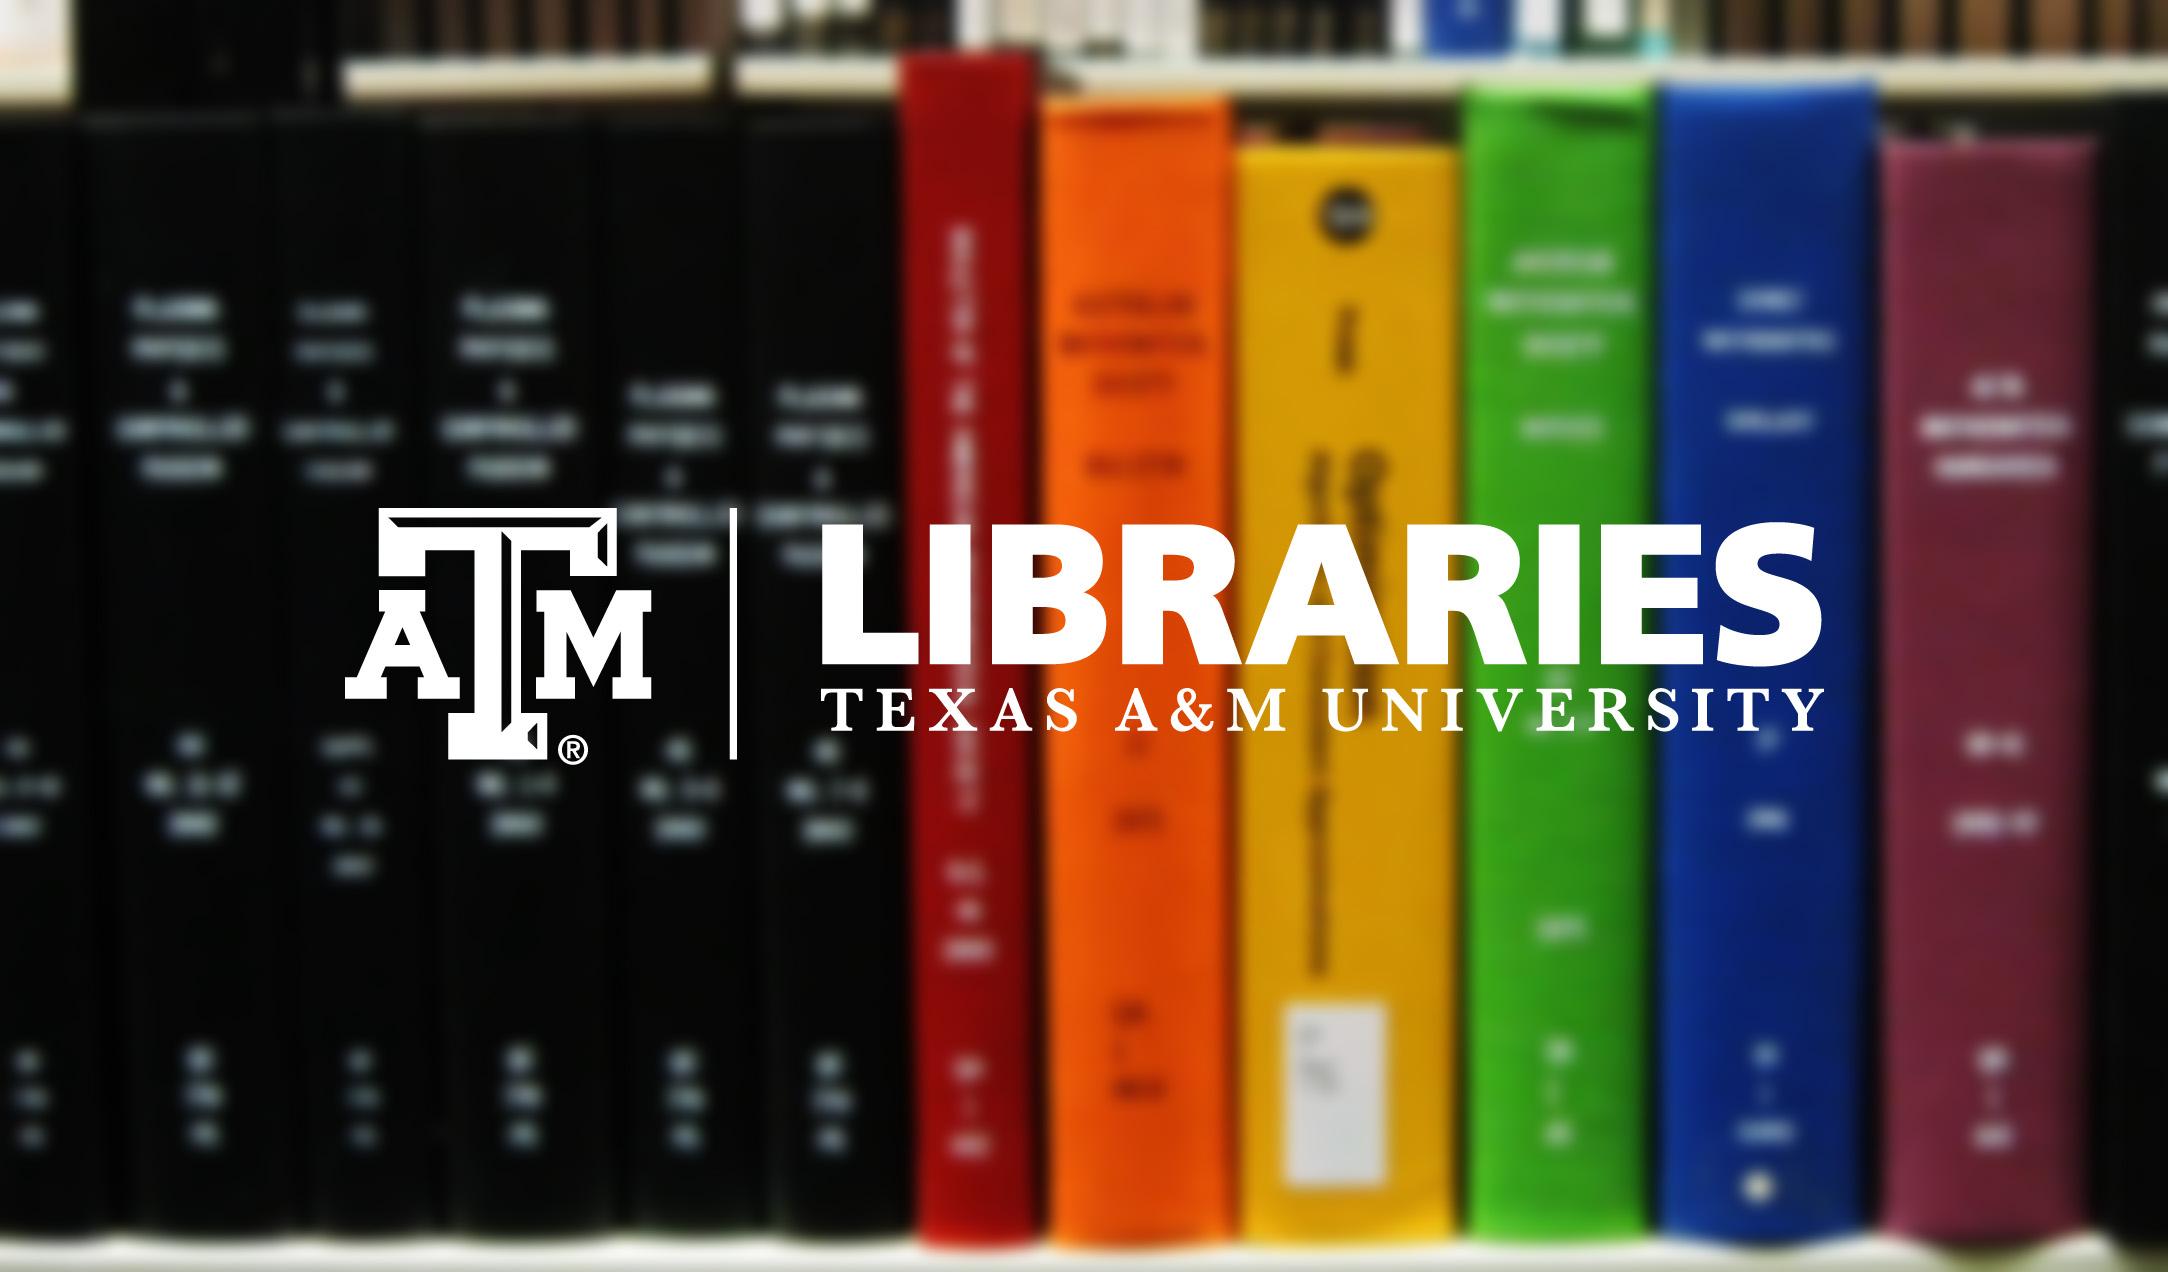 Texas A&M University Libraries